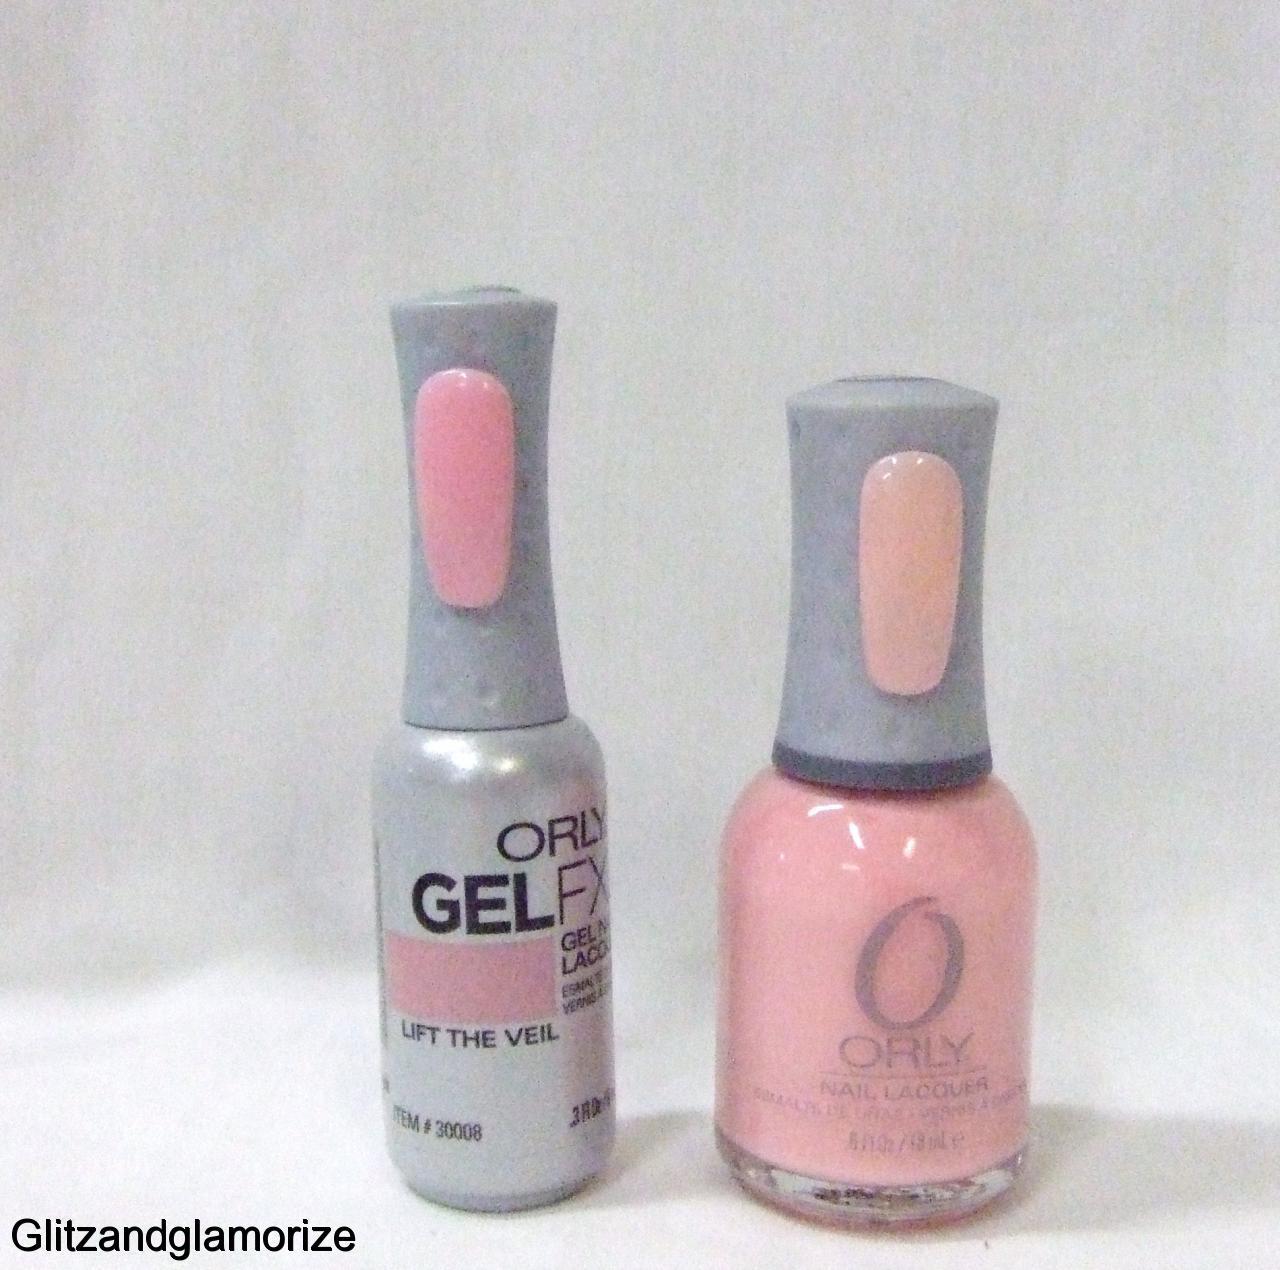 Orly GelFX Gel FX Gel Nail Lacquer + Nail Polish Lift The Veil 30008